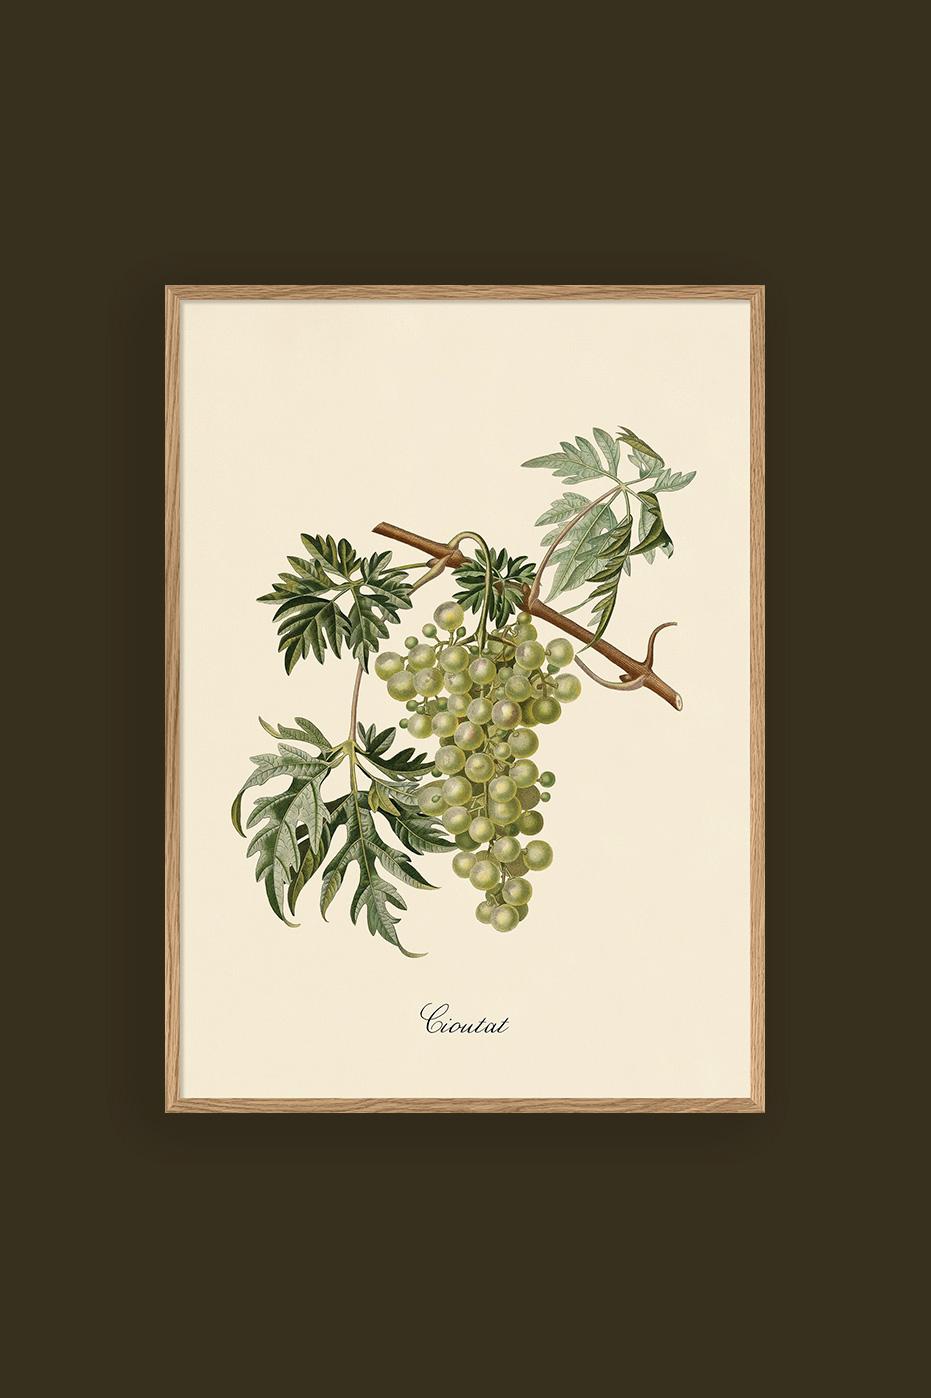 Green Grapes 30x40cm